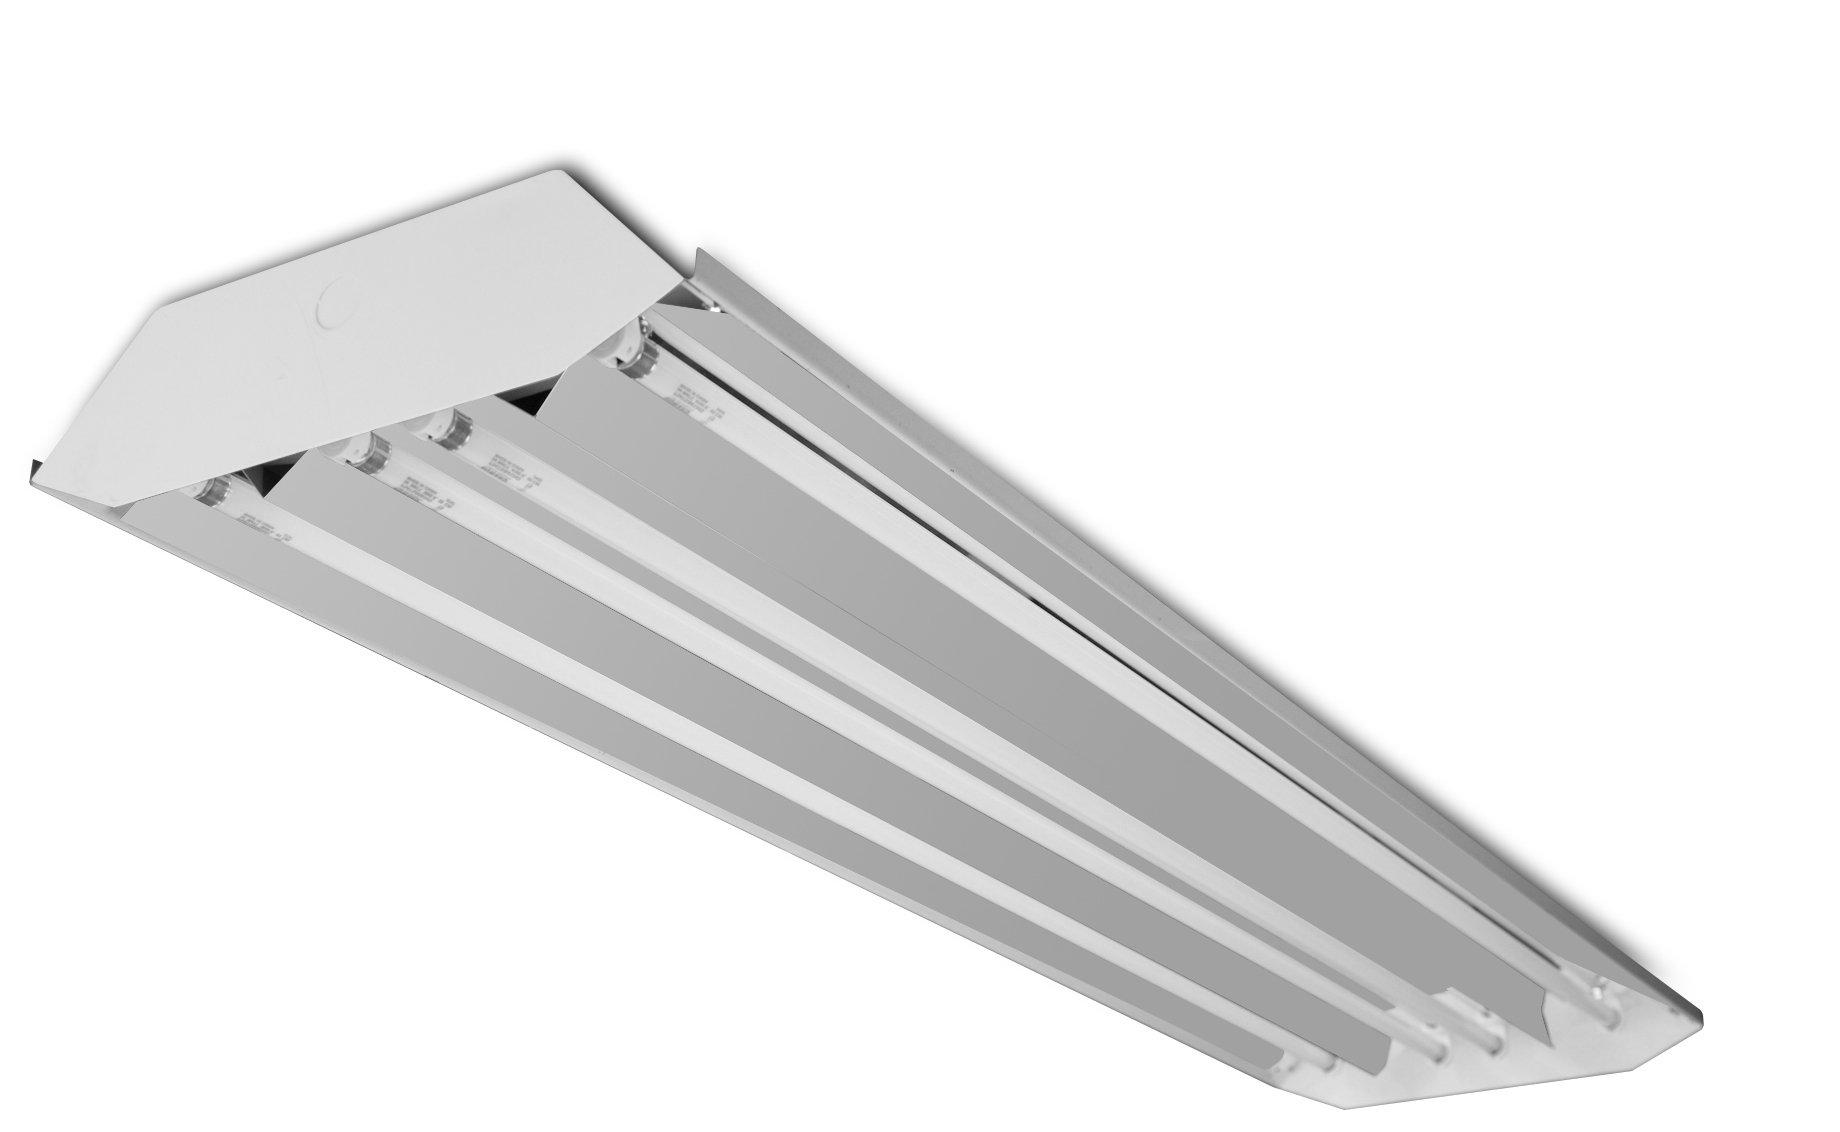 Howard Lighting HFB3E432AHEMV000000I 4 Lamp High Bay Fluorescent Enhanced Specular Aluminum Reflector